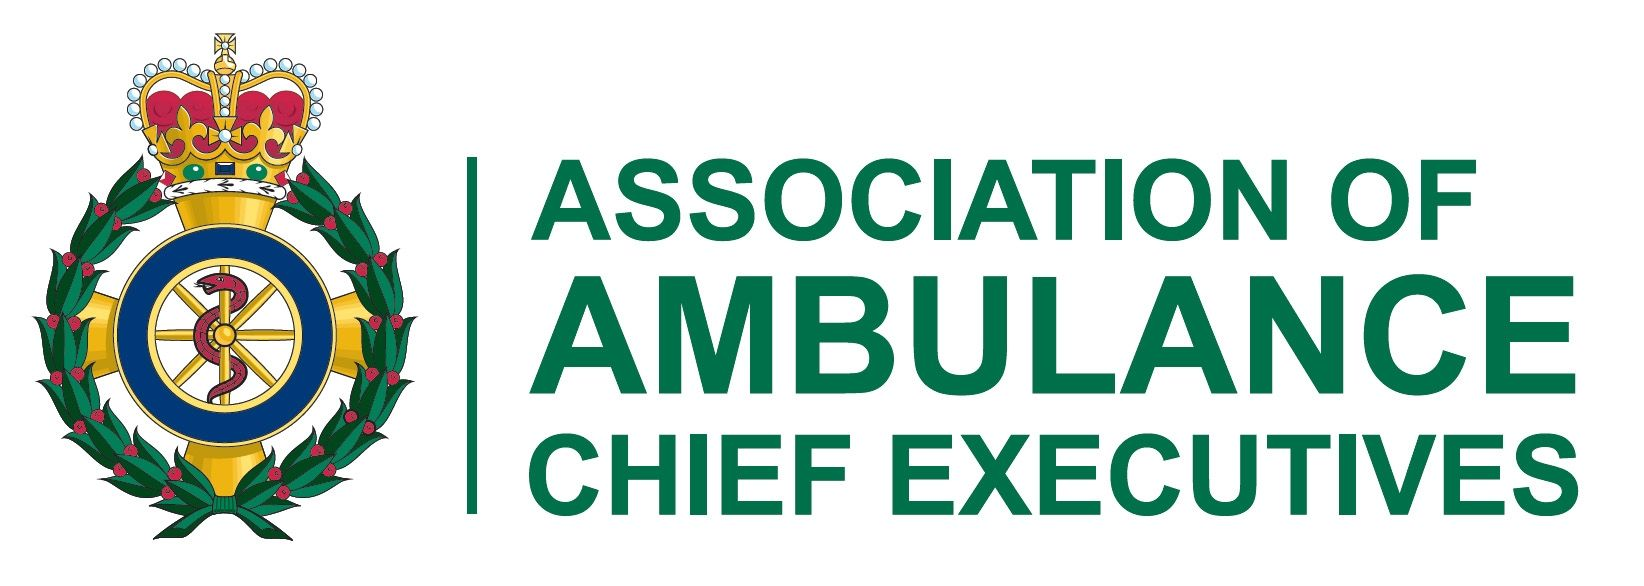 Association of Ambulance Chief Executives